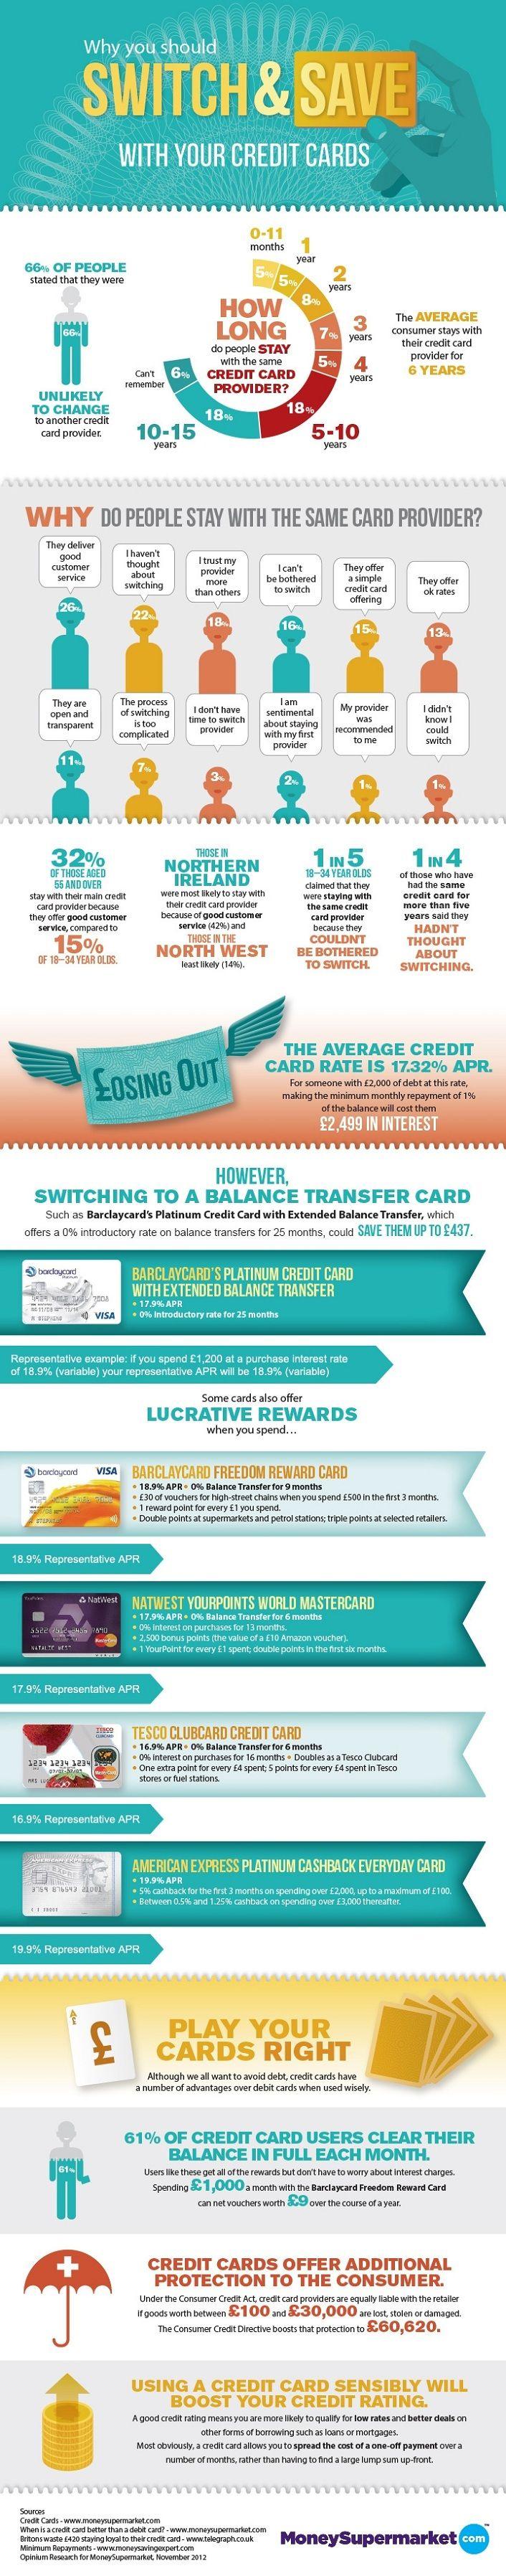 25+ Best Ideas About Improve Credit Score On Pinterest  Fixing Credit  Score, Credit Card Pin And Improve Your Credit Score